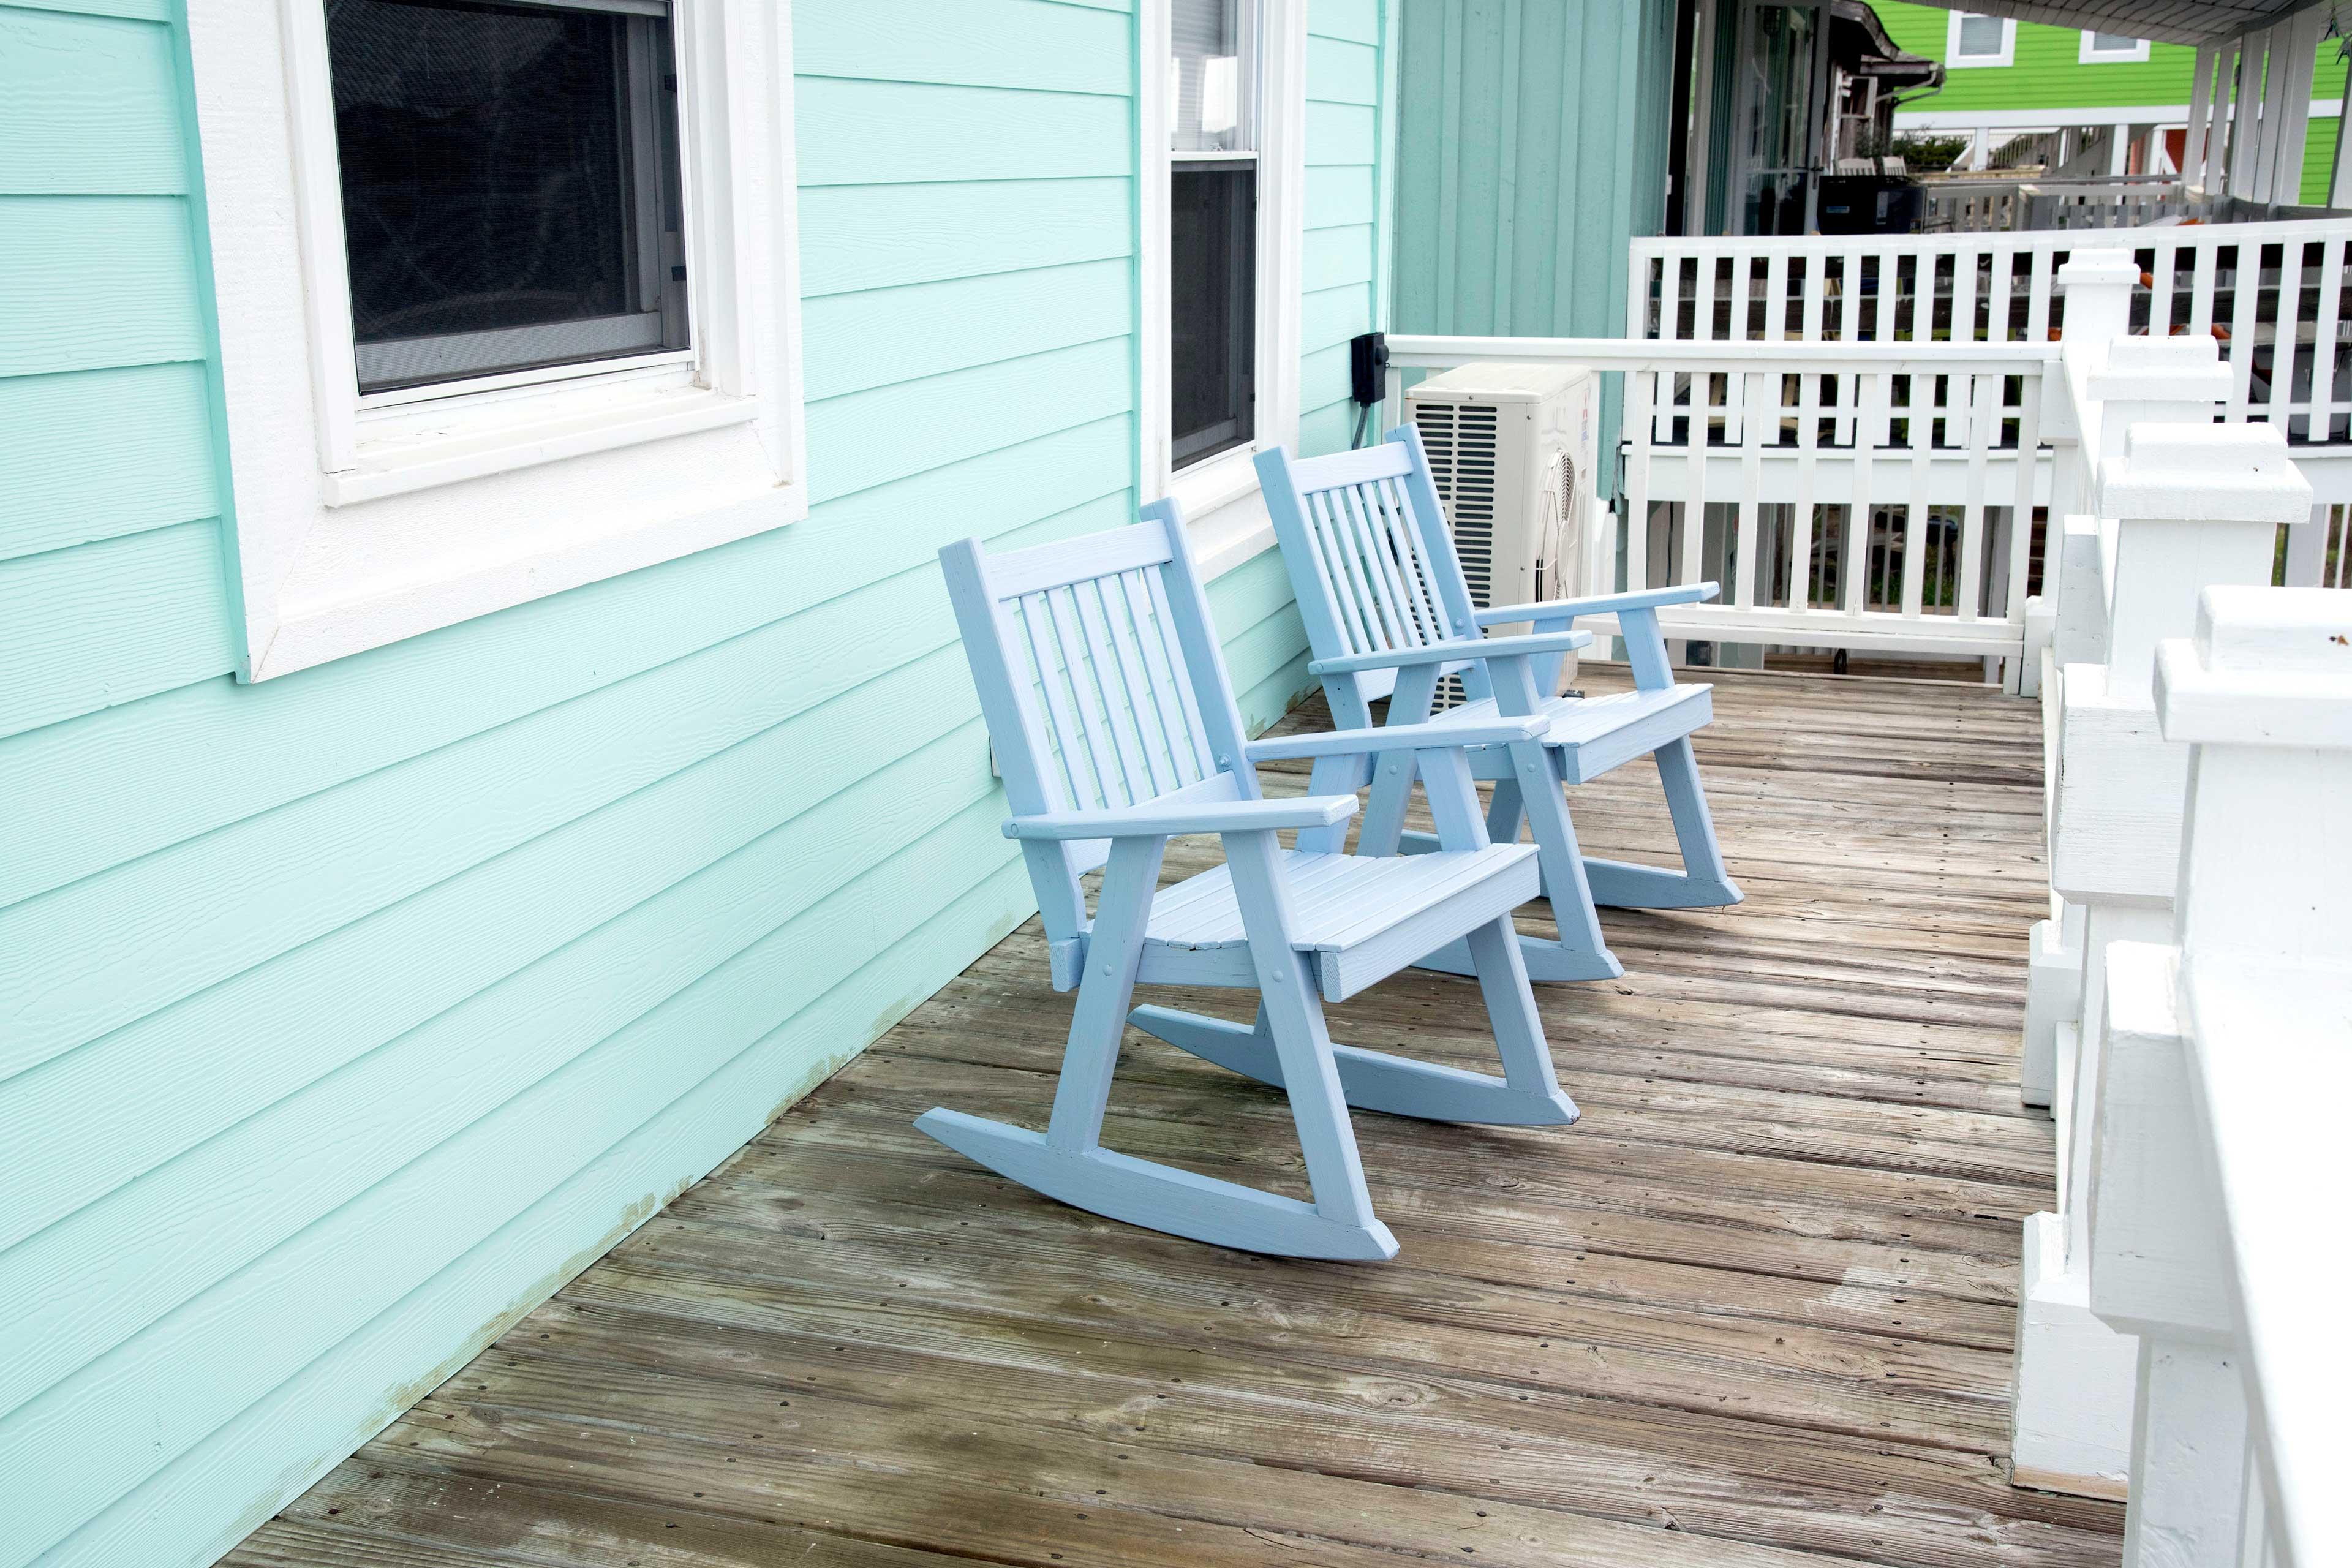 Soak up the sunshine on the porch.